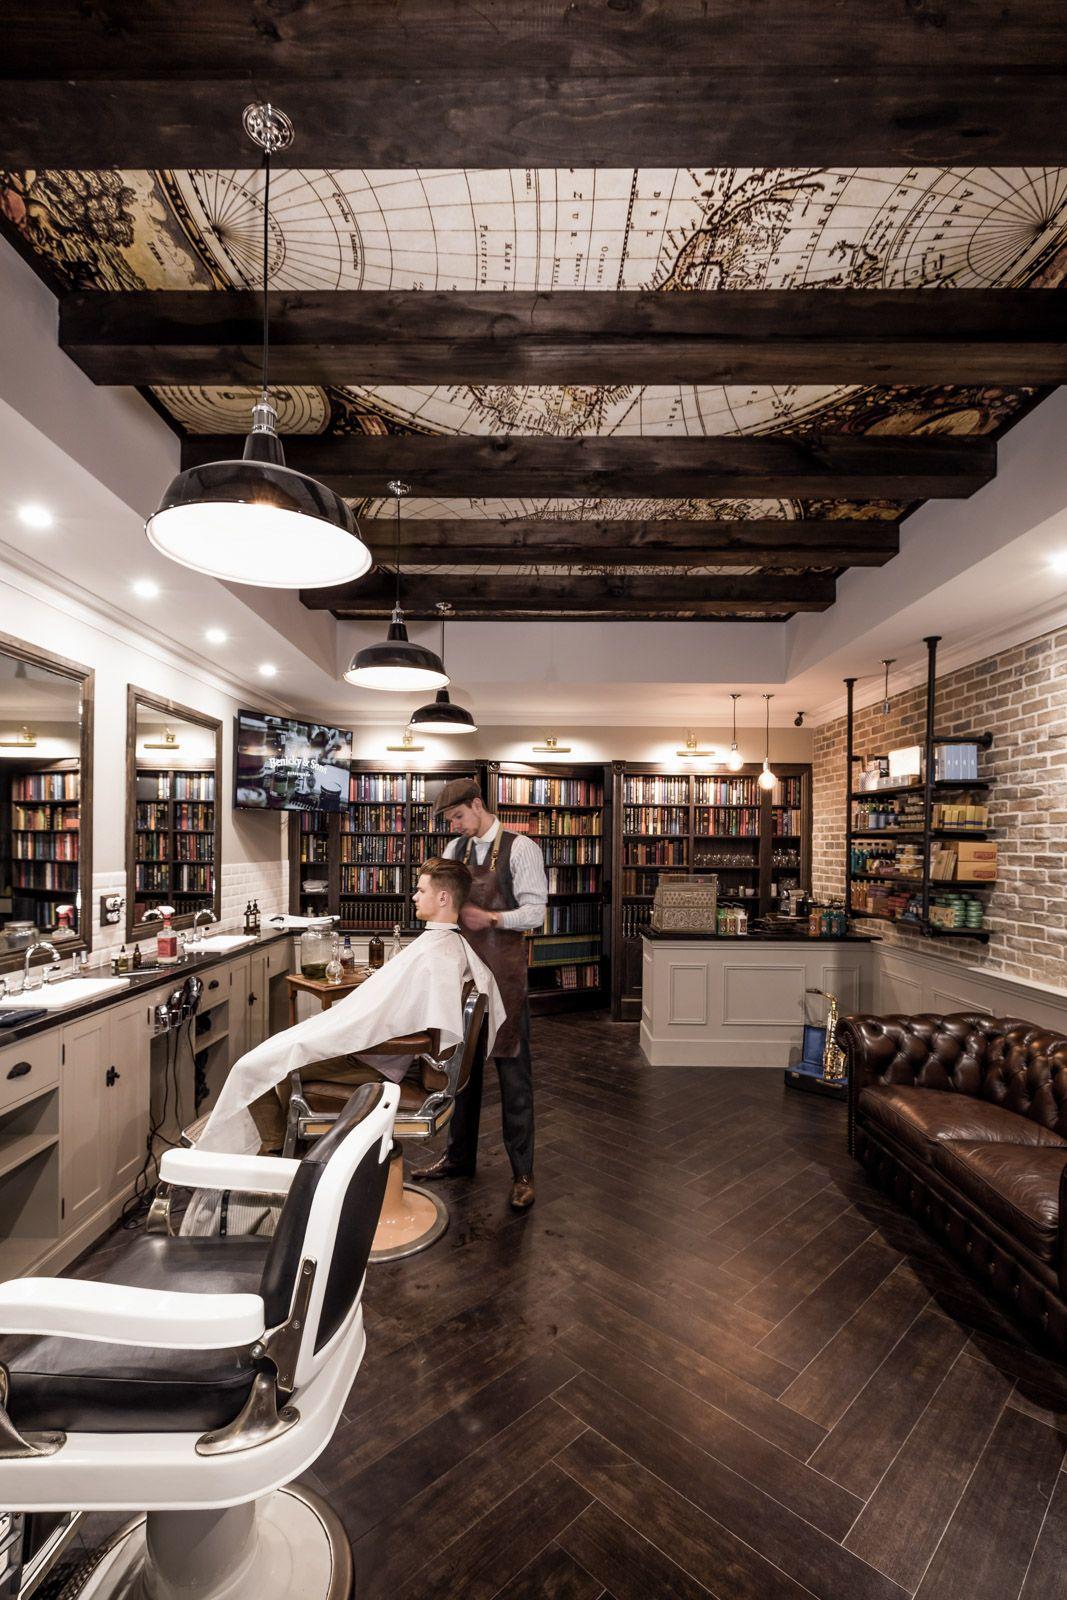 Danielmalik design portfolio interior design of benicky sons traditional barber shop in - Barber shop interior ...